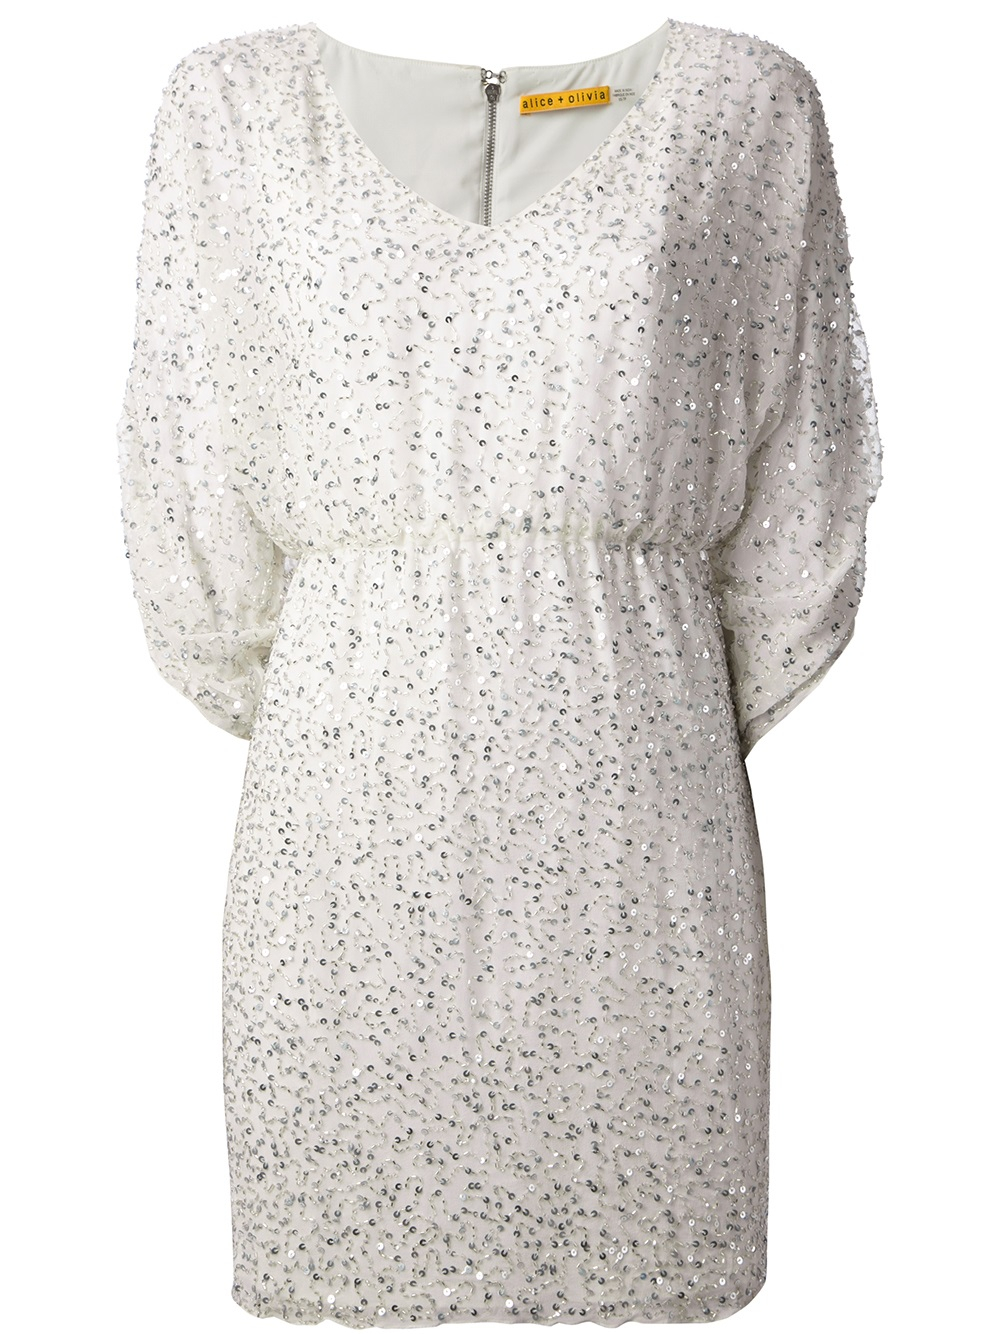 Alice Olivia Silver Tone Sequin Dress In White Lyst